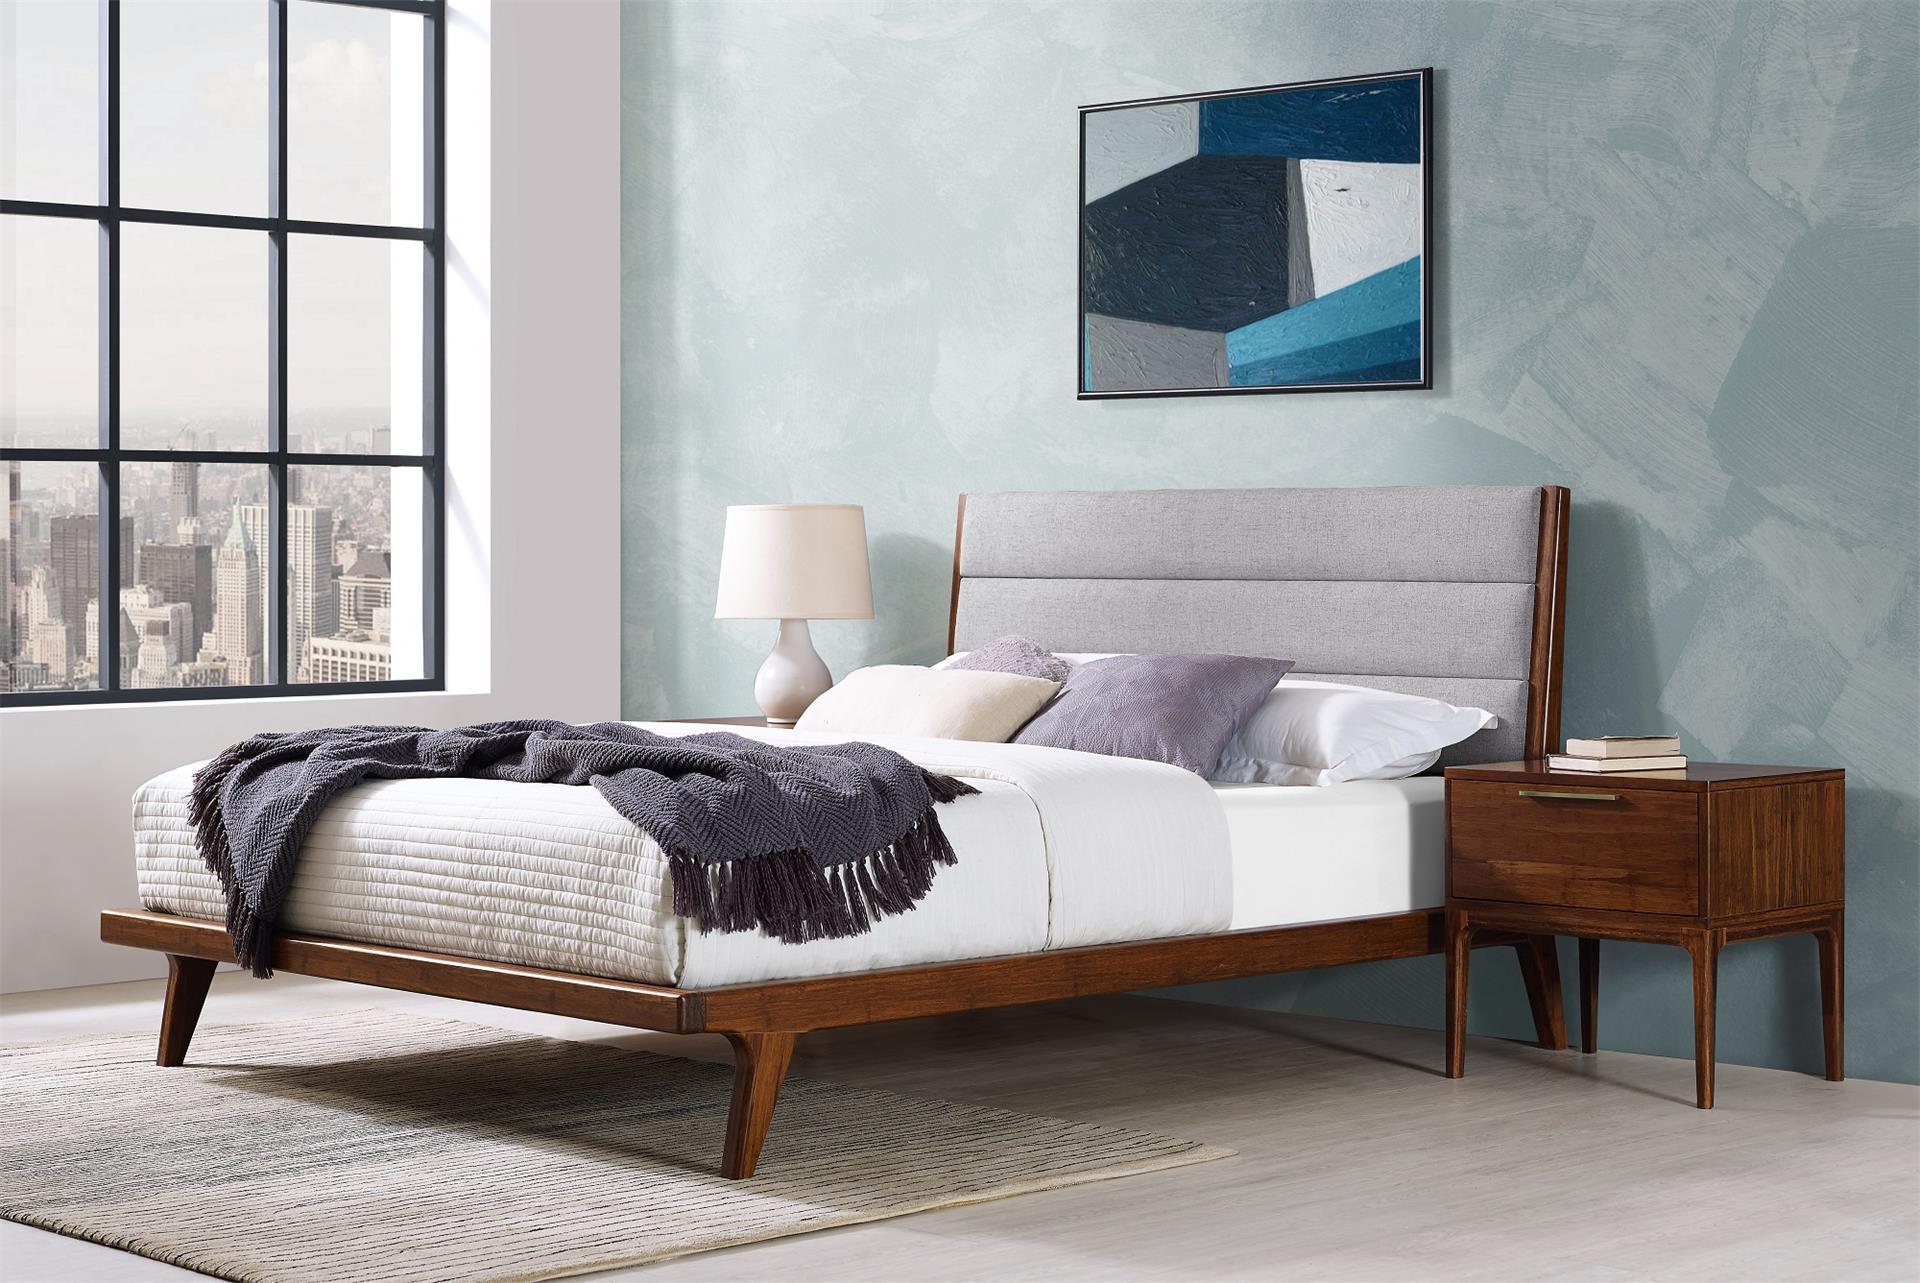 greenington mercury 3 piece upholstered bamboo bedroom set